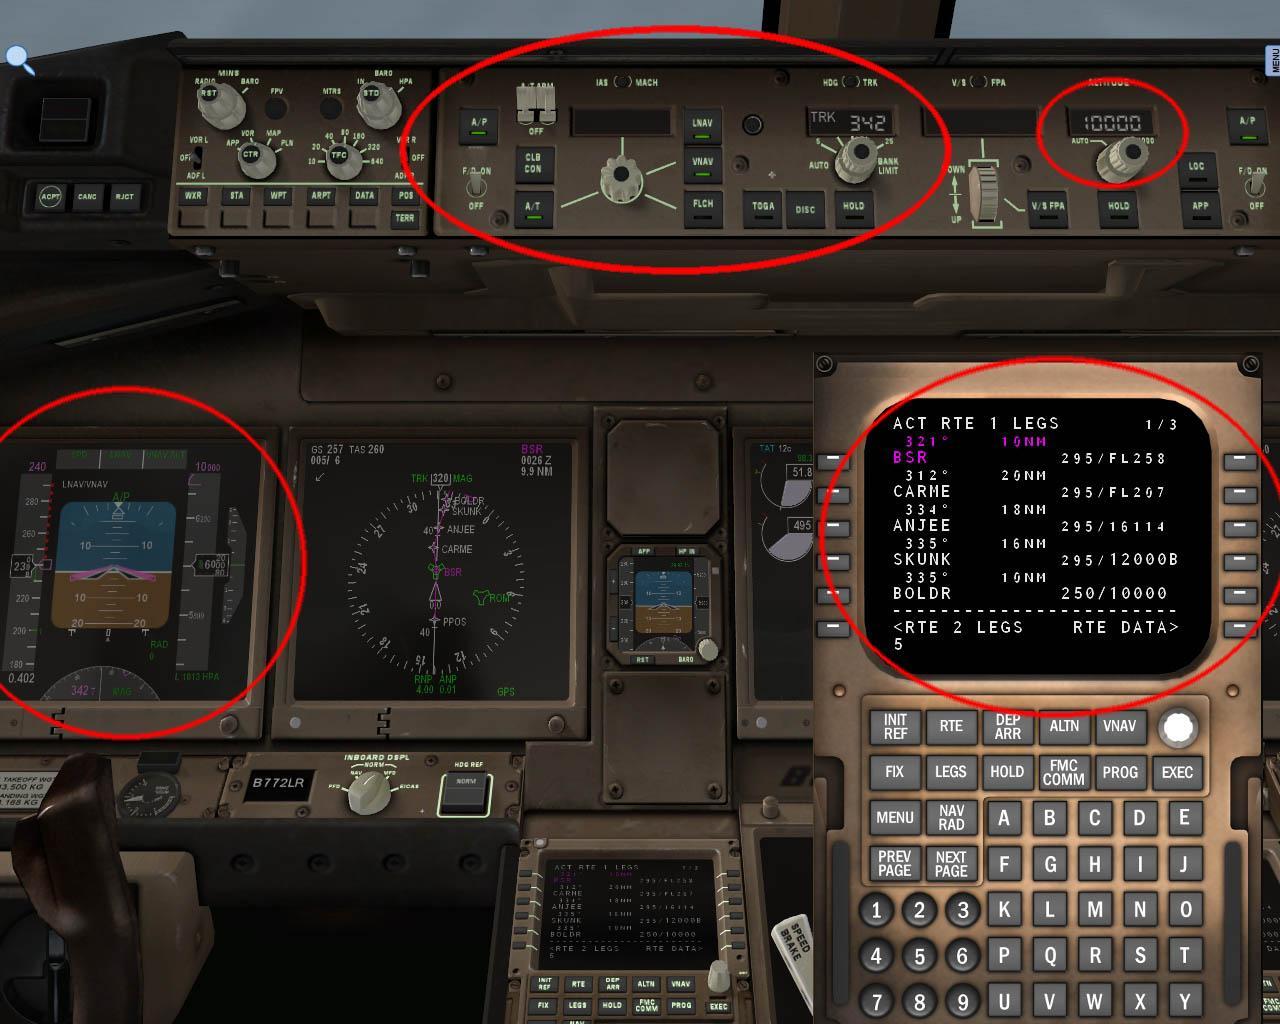 777-200LR_5.jpg